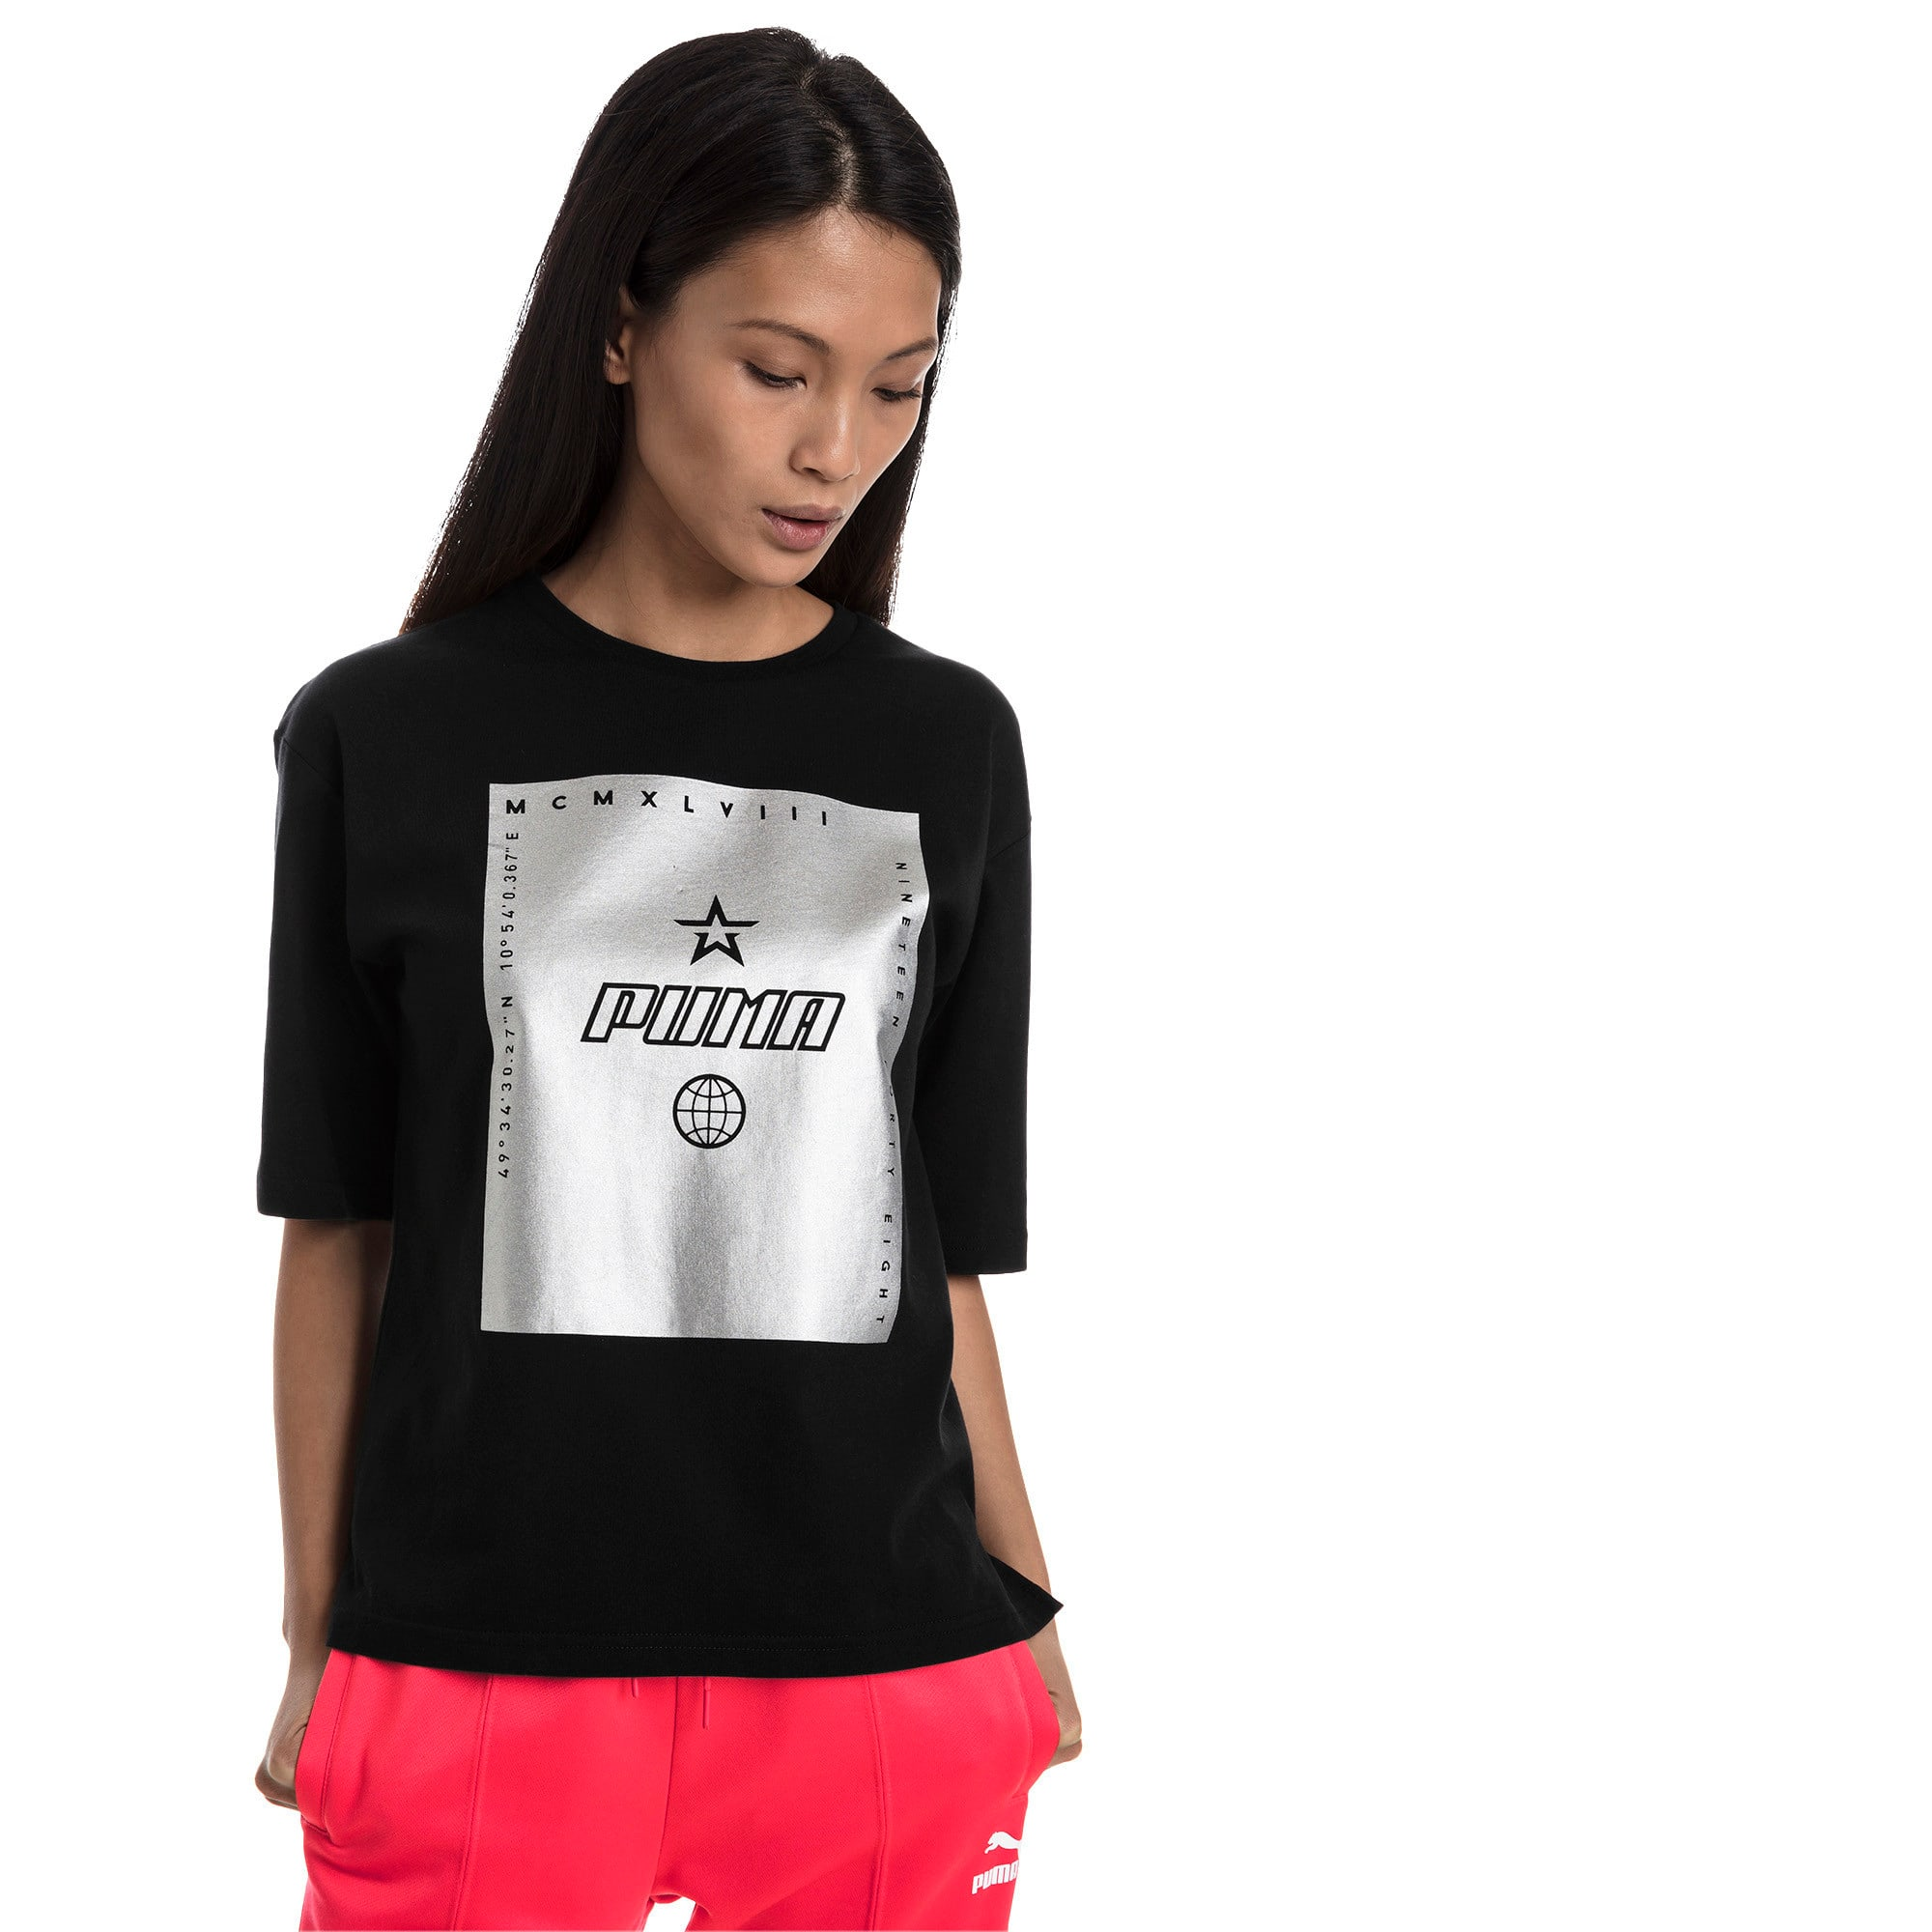 Miniatura 2 de Camiseta Trailblazer para mujer, Cotton Black, mediano